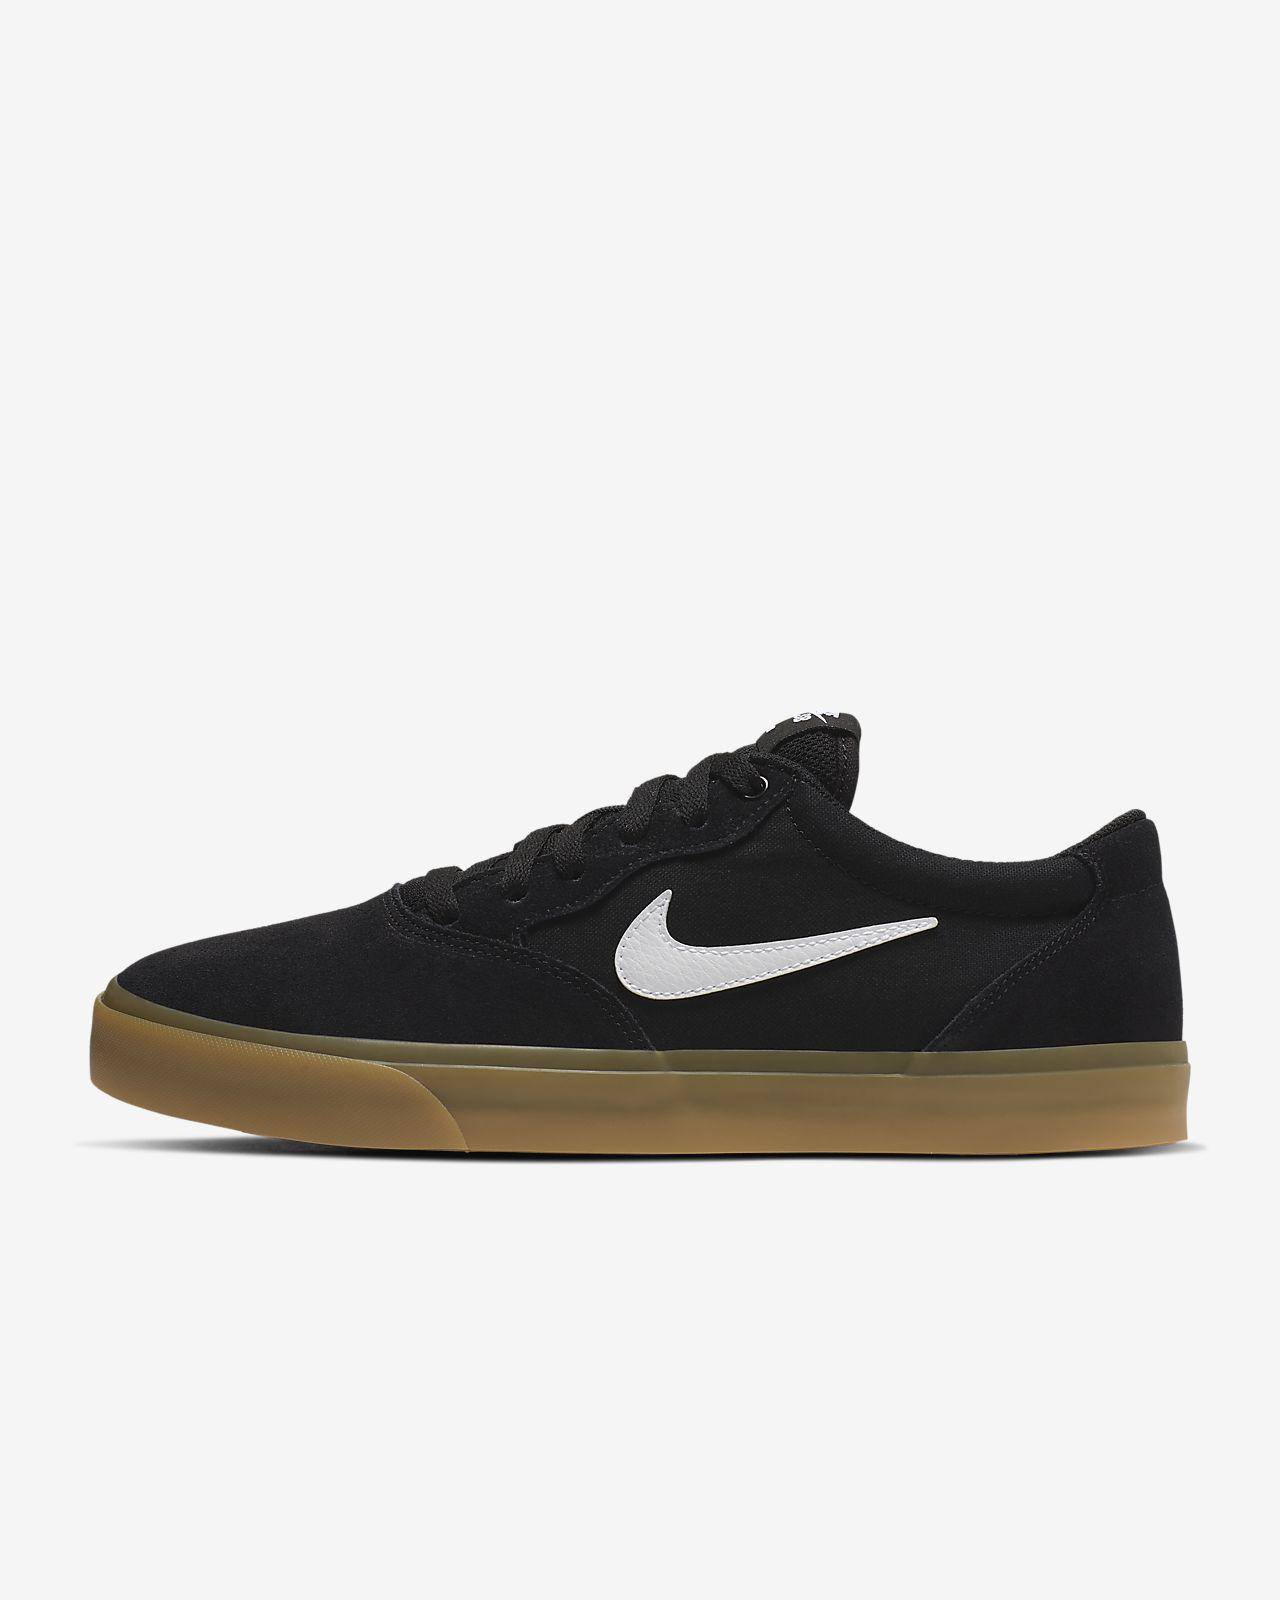 Sapatilhas de skateboard Nike SB Chron Solarsoft